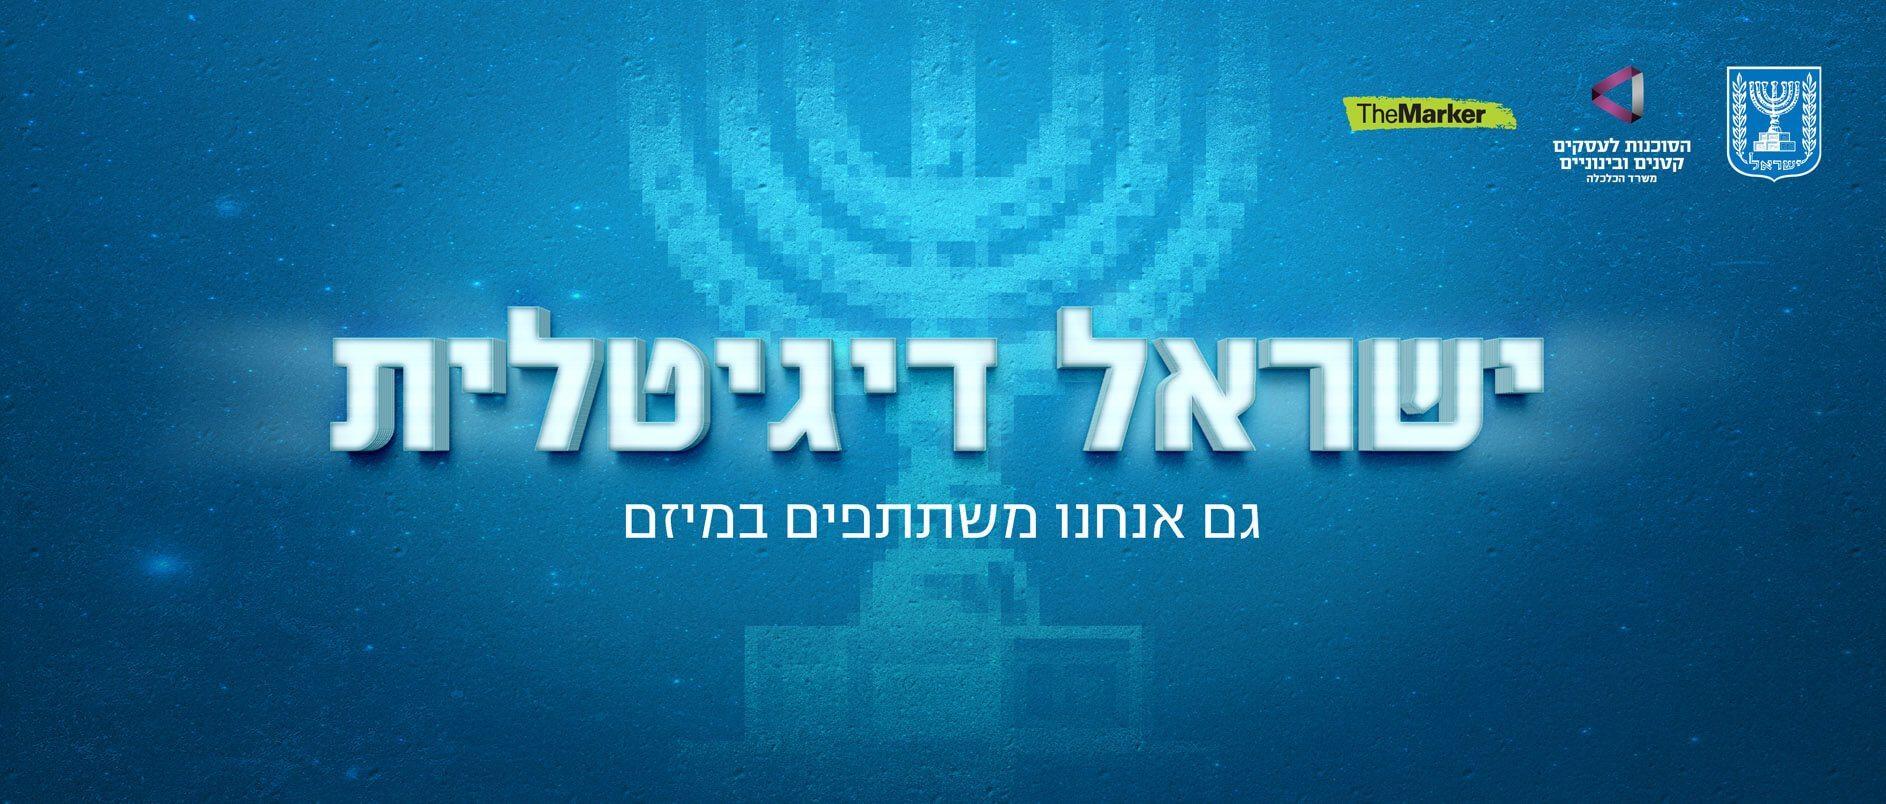 Dotweb_DigitalIsrael_Slider1